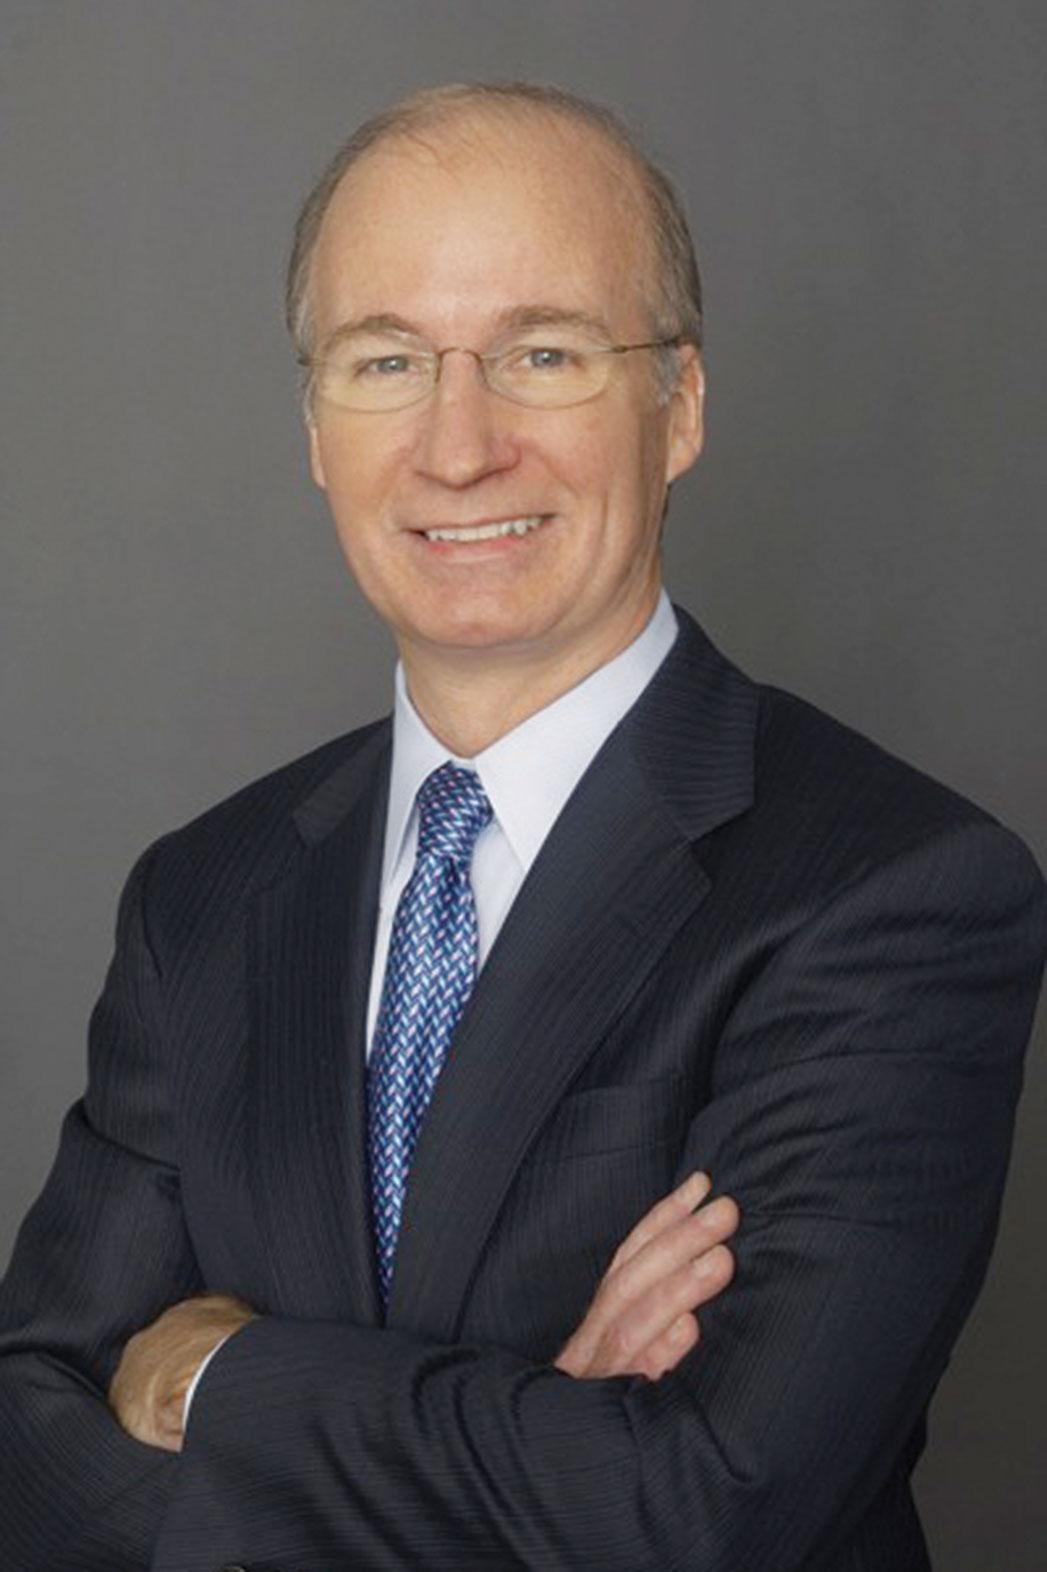 John Nallen